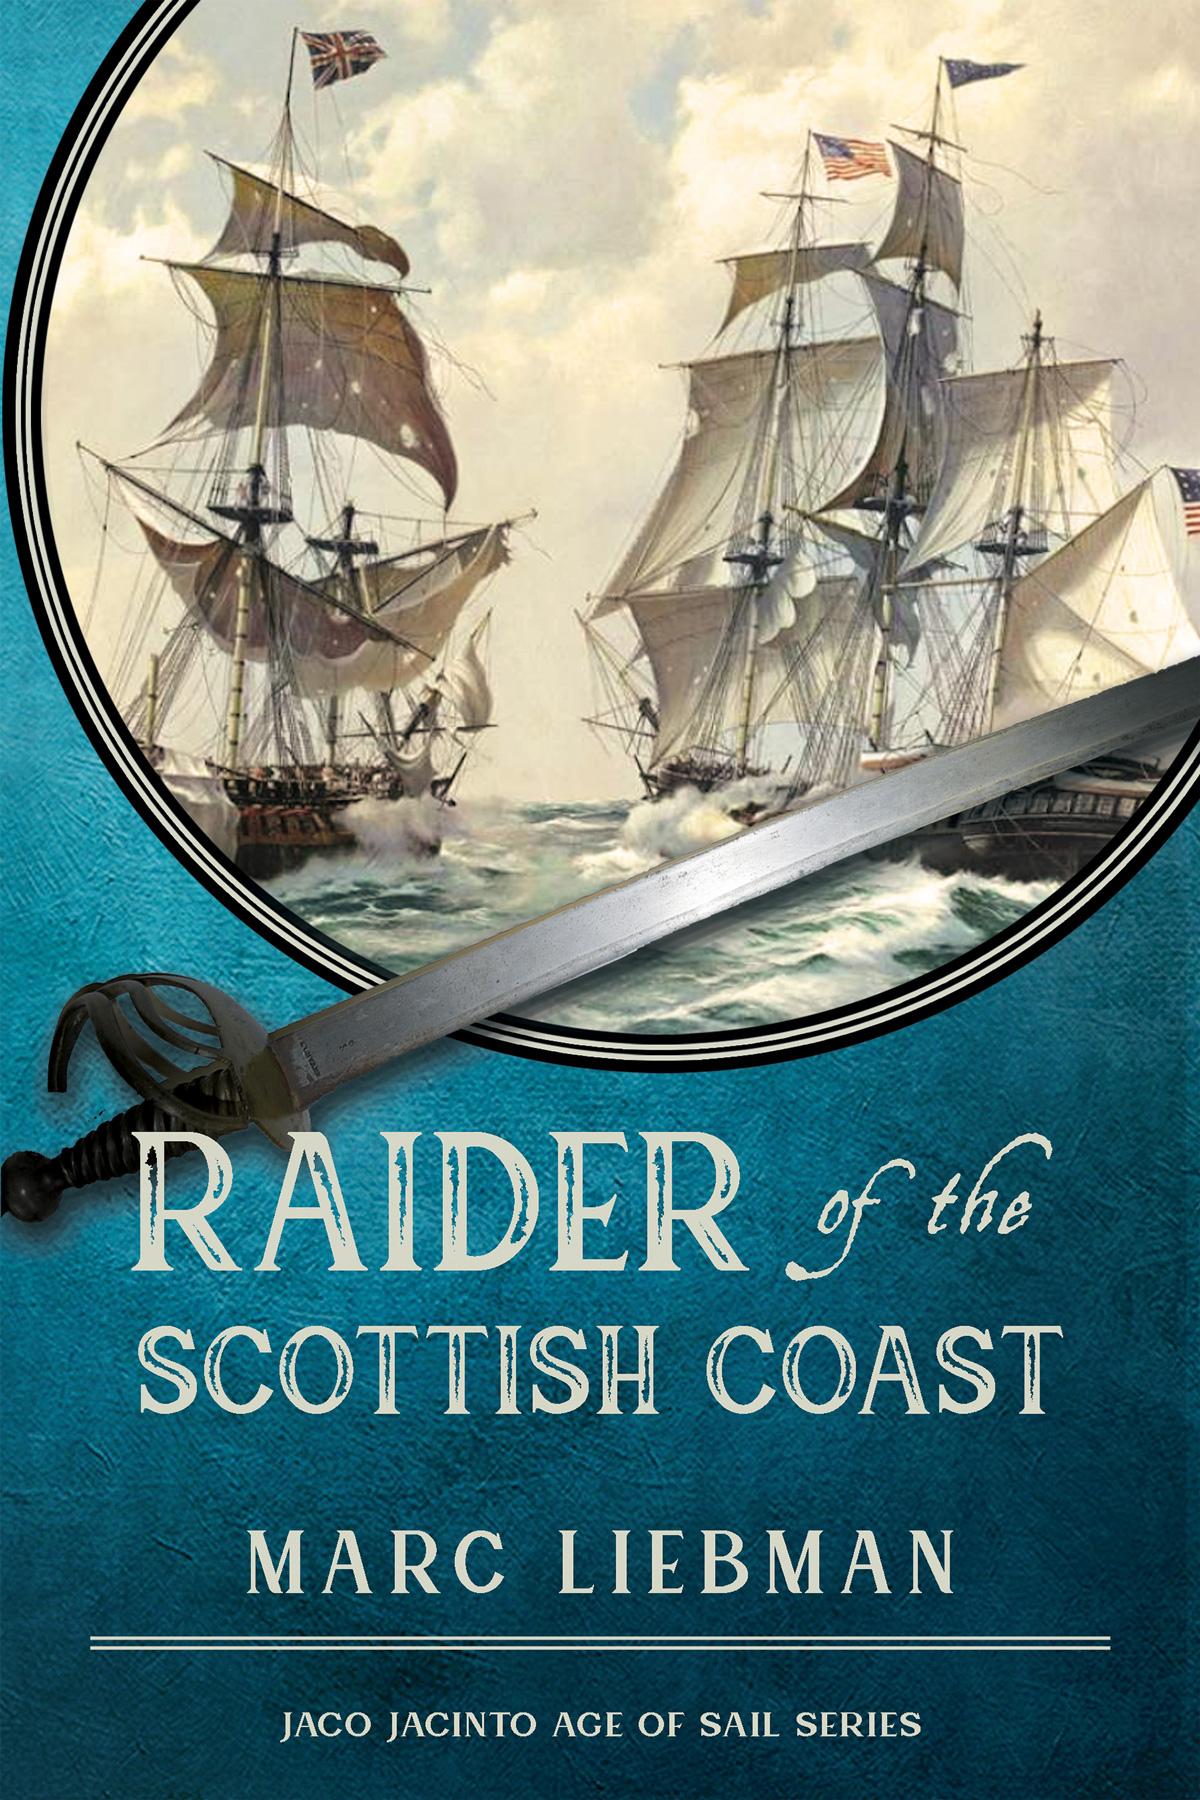 Raider of the Scottish Coast